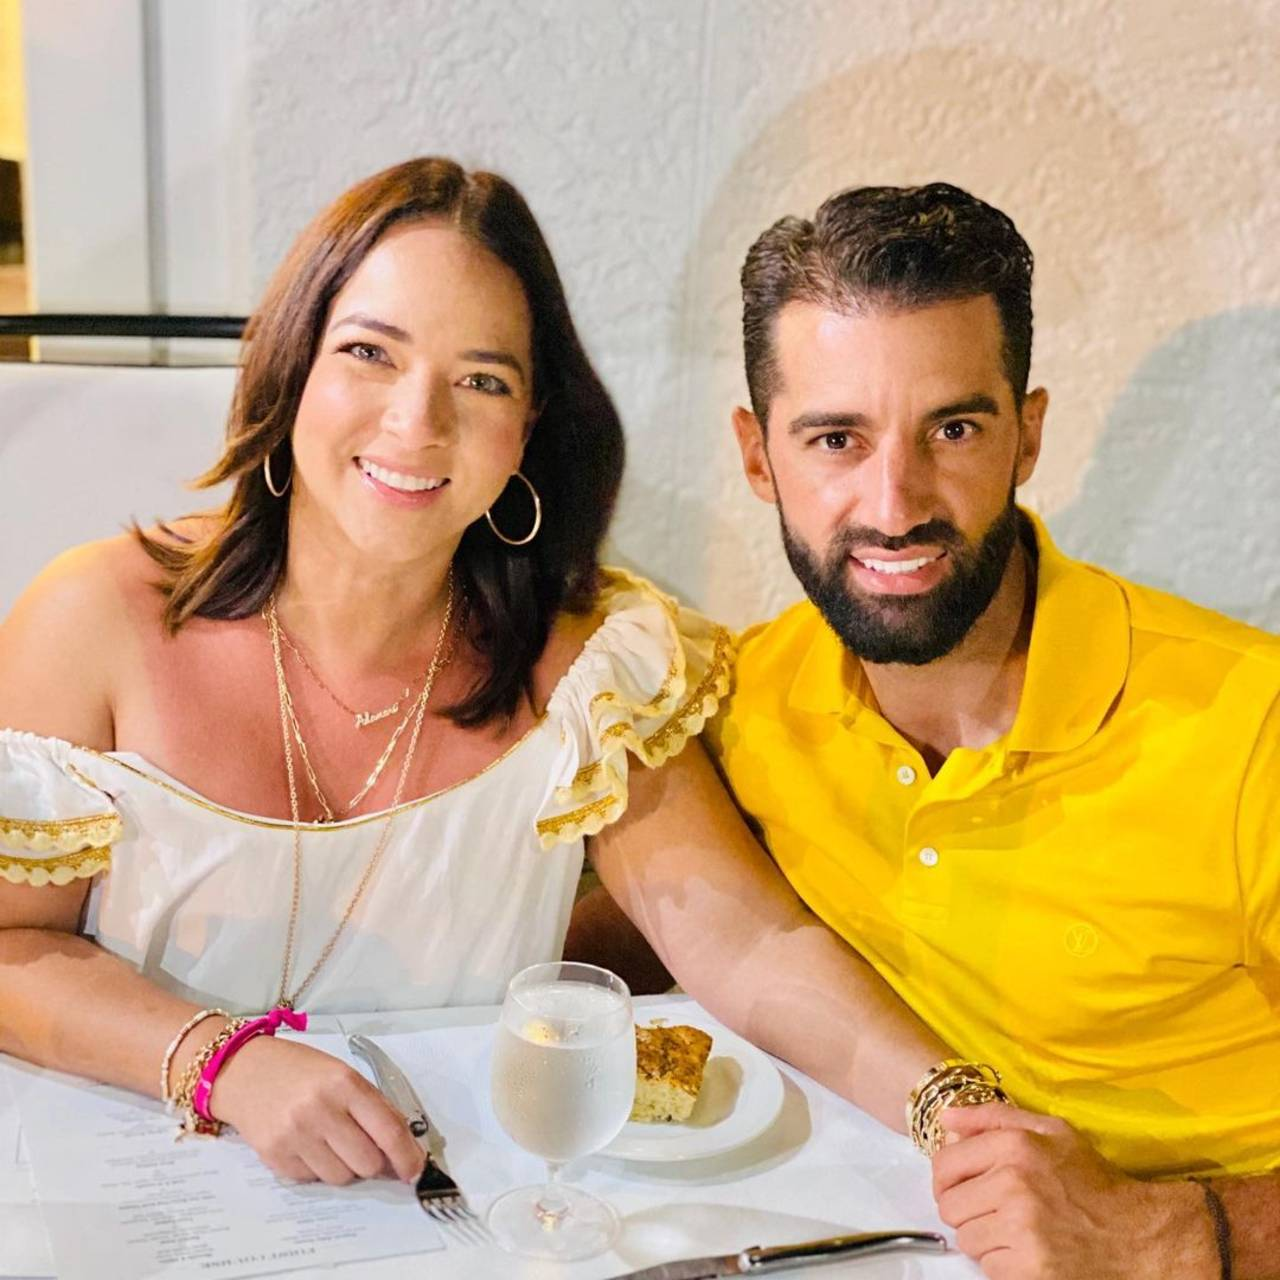 Adamari López y Toni Costa en terapia de pareja cristiana